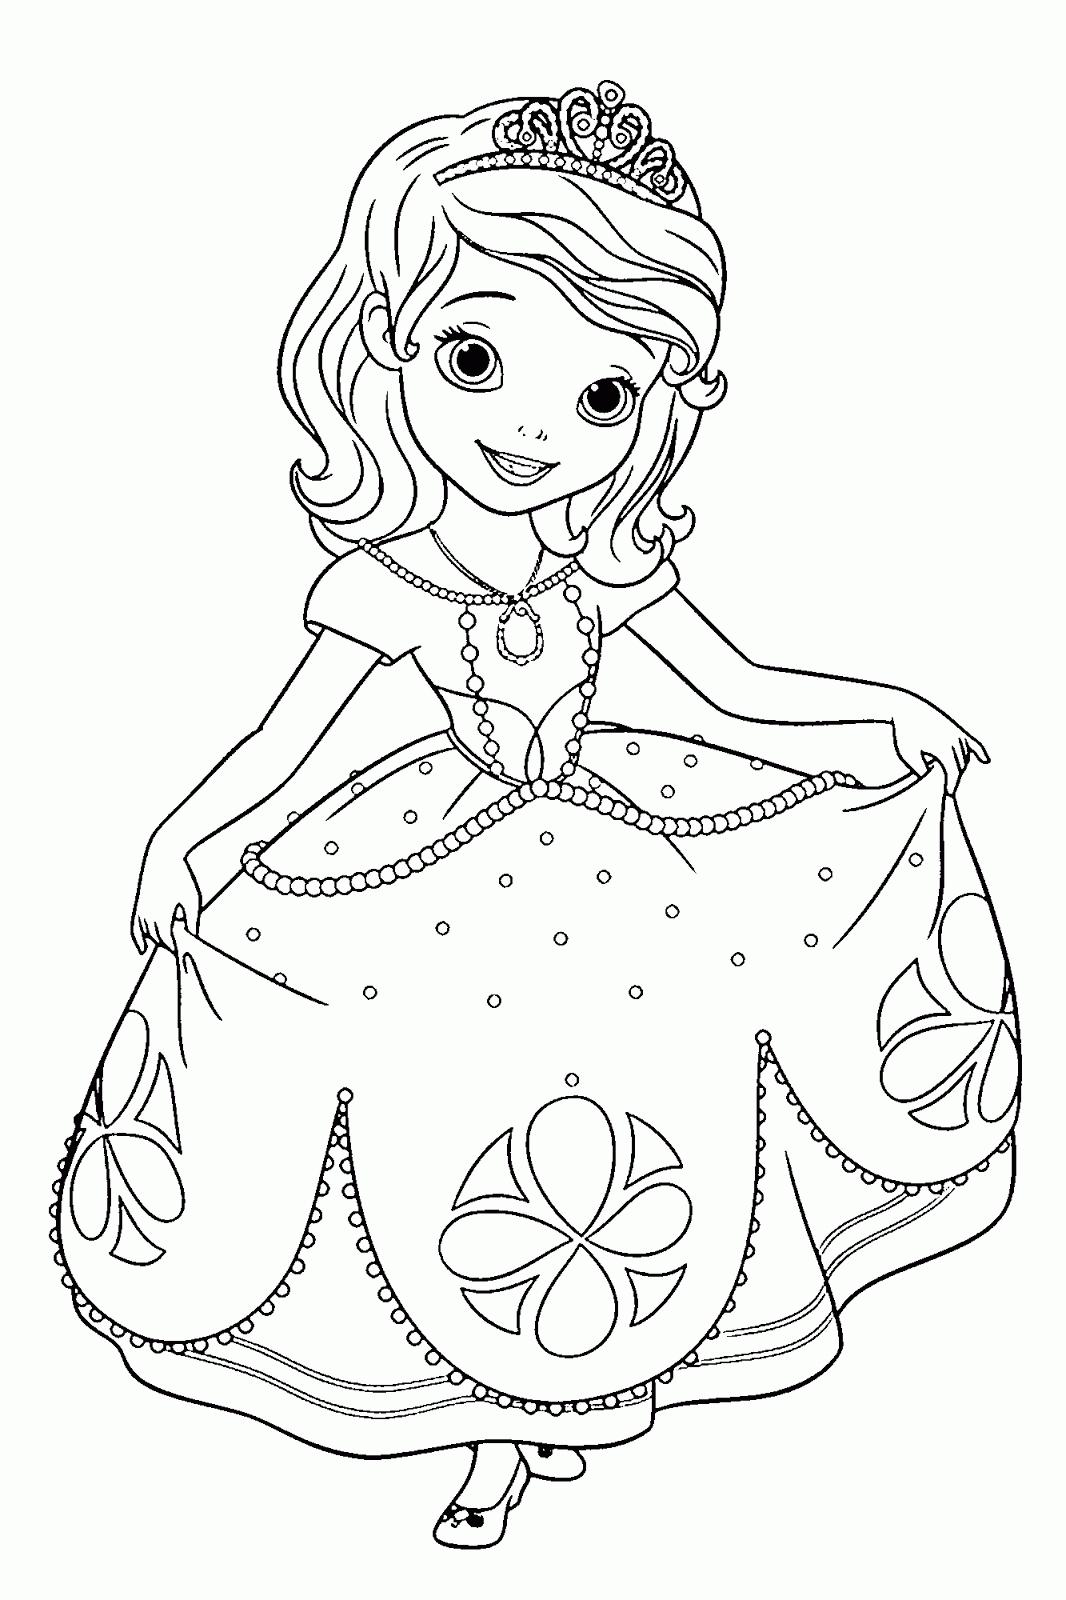 Dibujos de la princesa sofia para colorear dibujos disney for Dibujo de una piedra para colorear